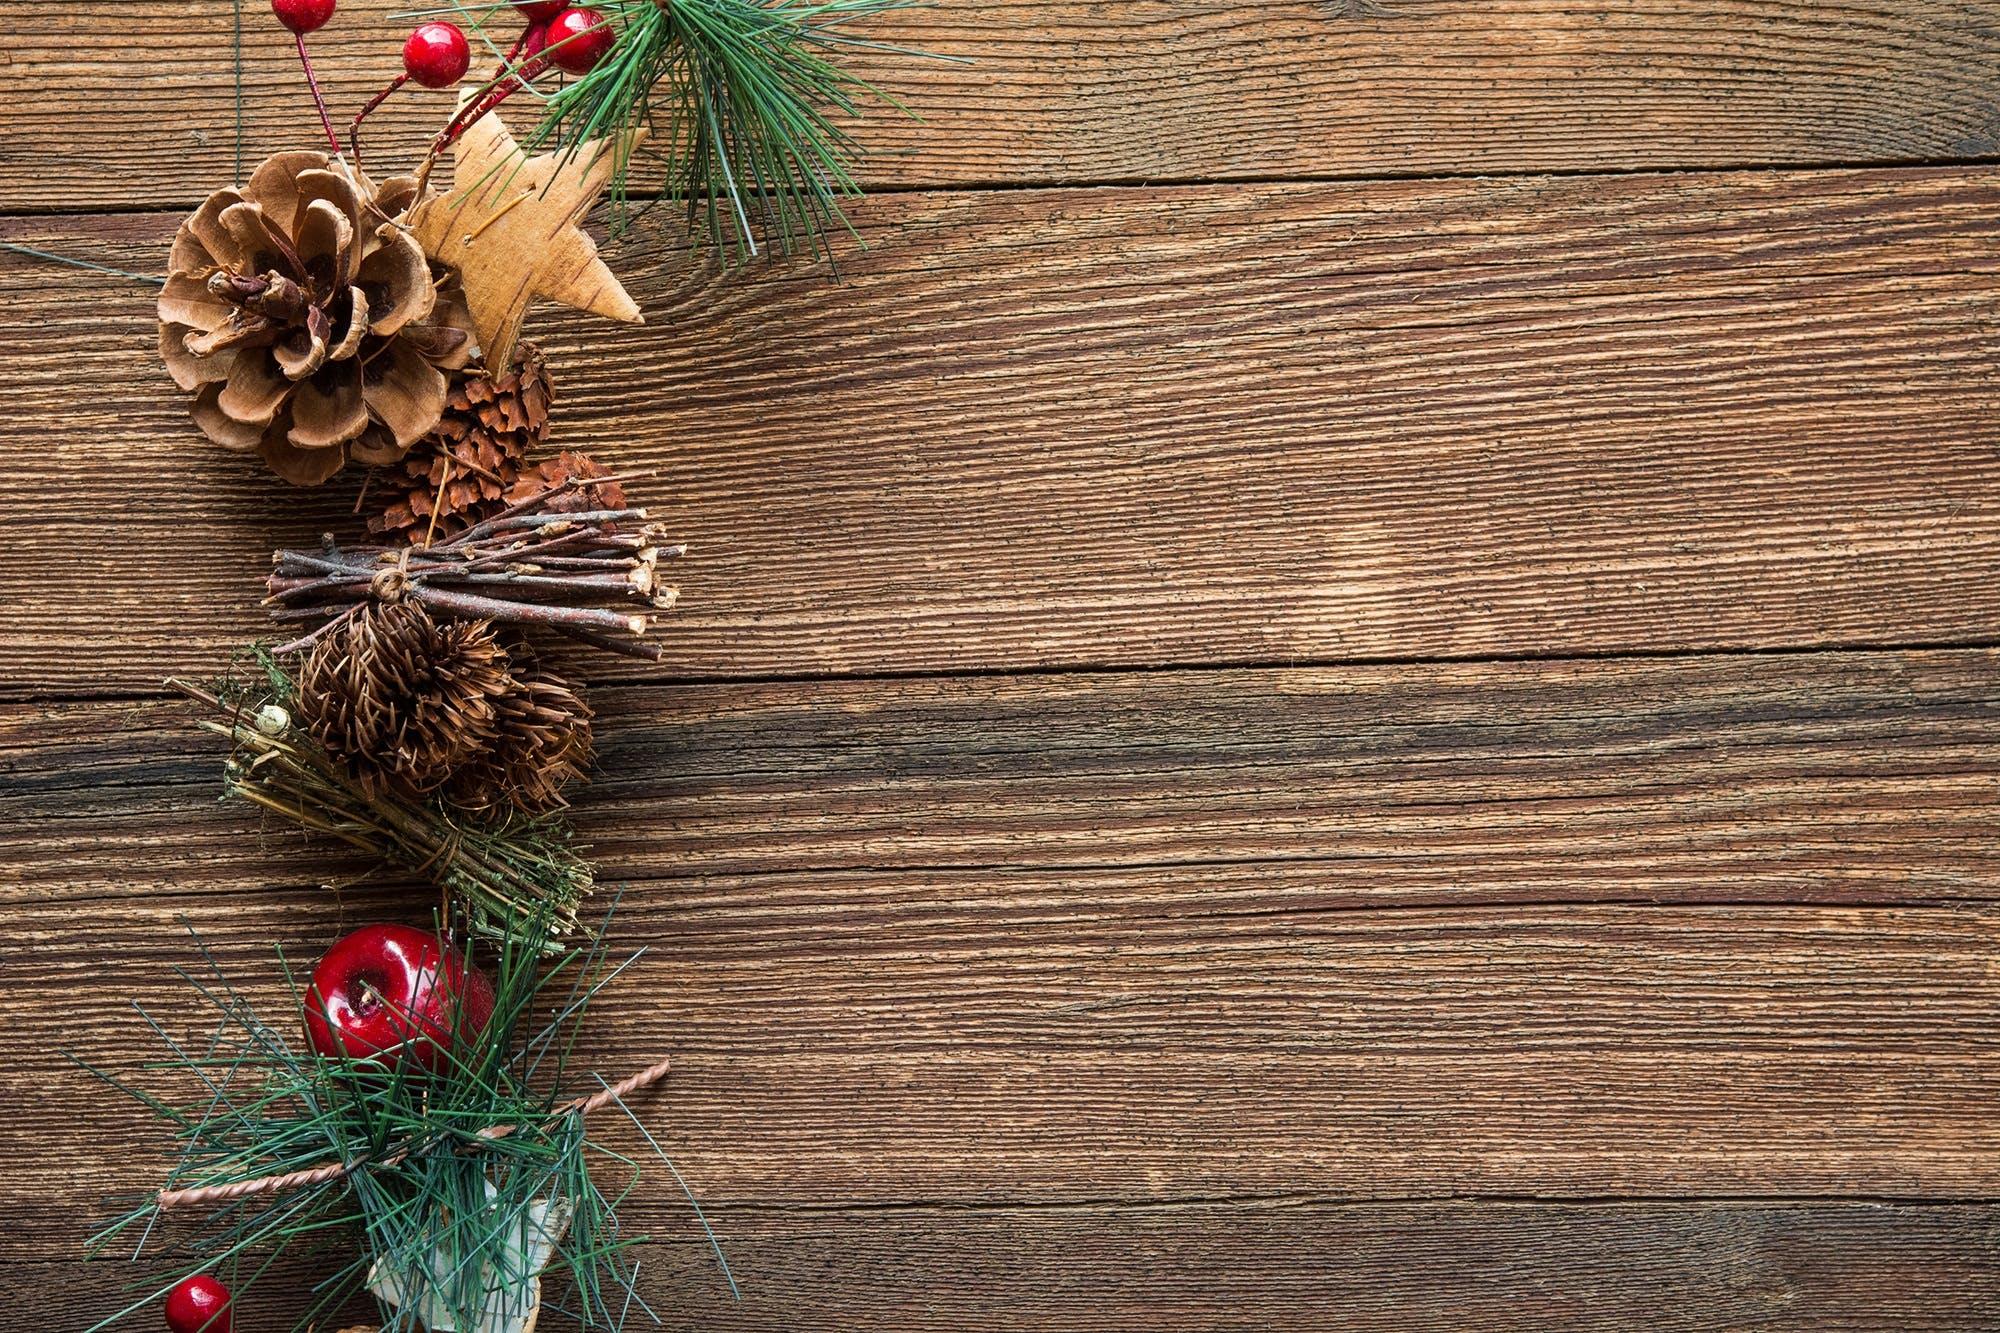 Brown Mistletoe and Pinecone Christmas Decor